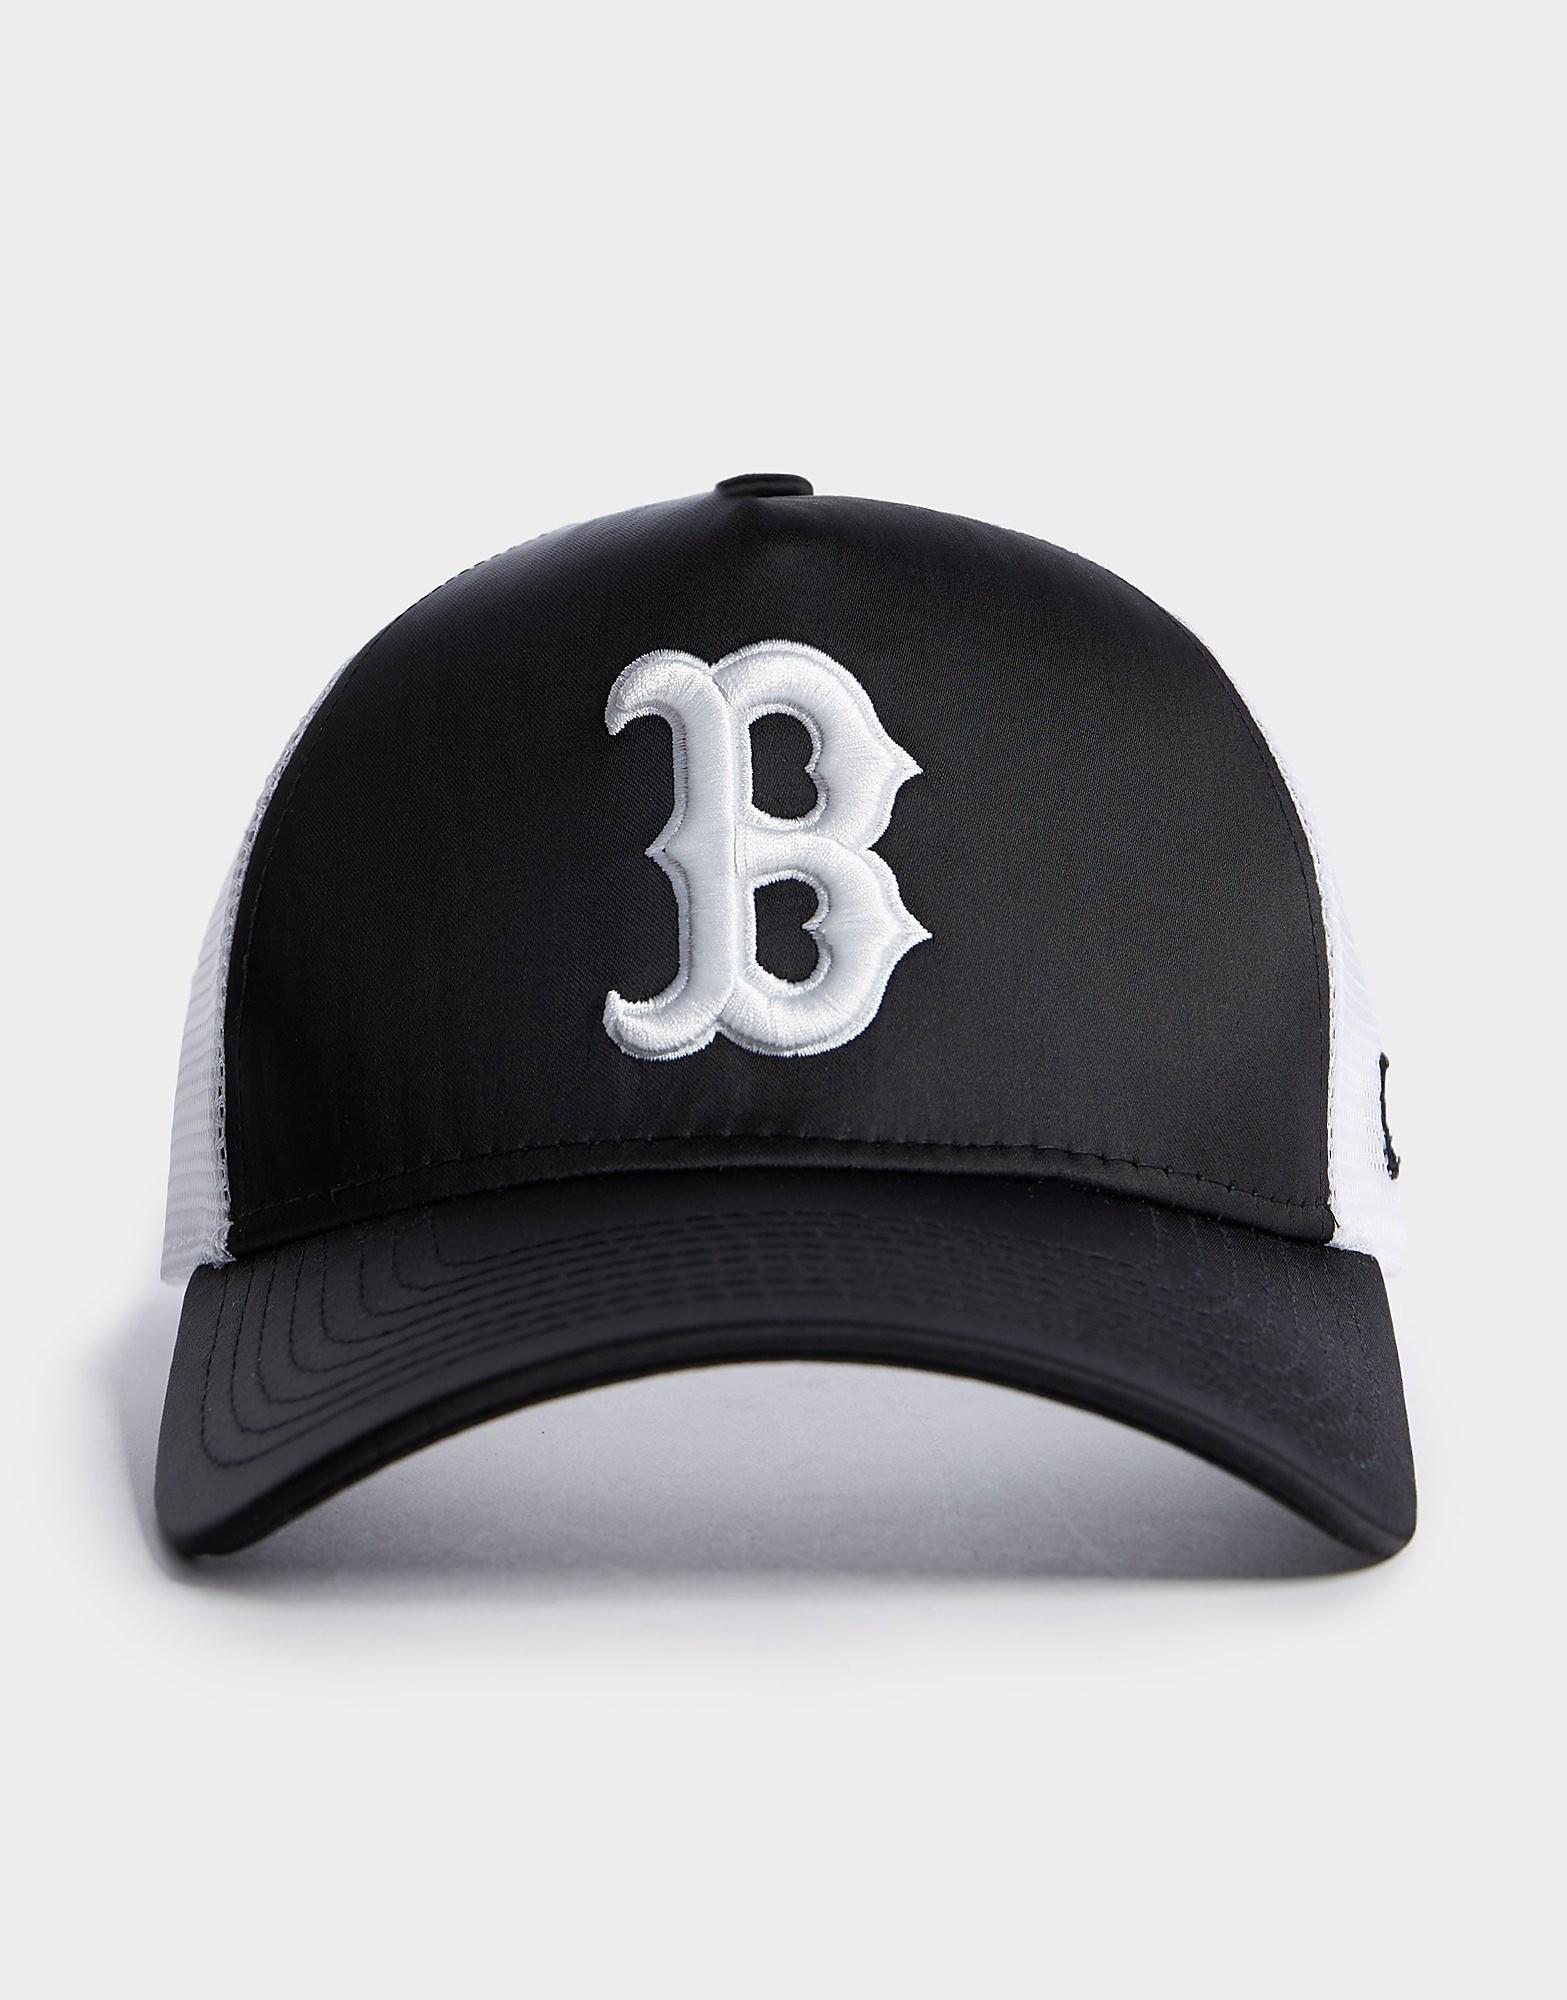 New Era MLB Boston Red Sox Trucker Cap